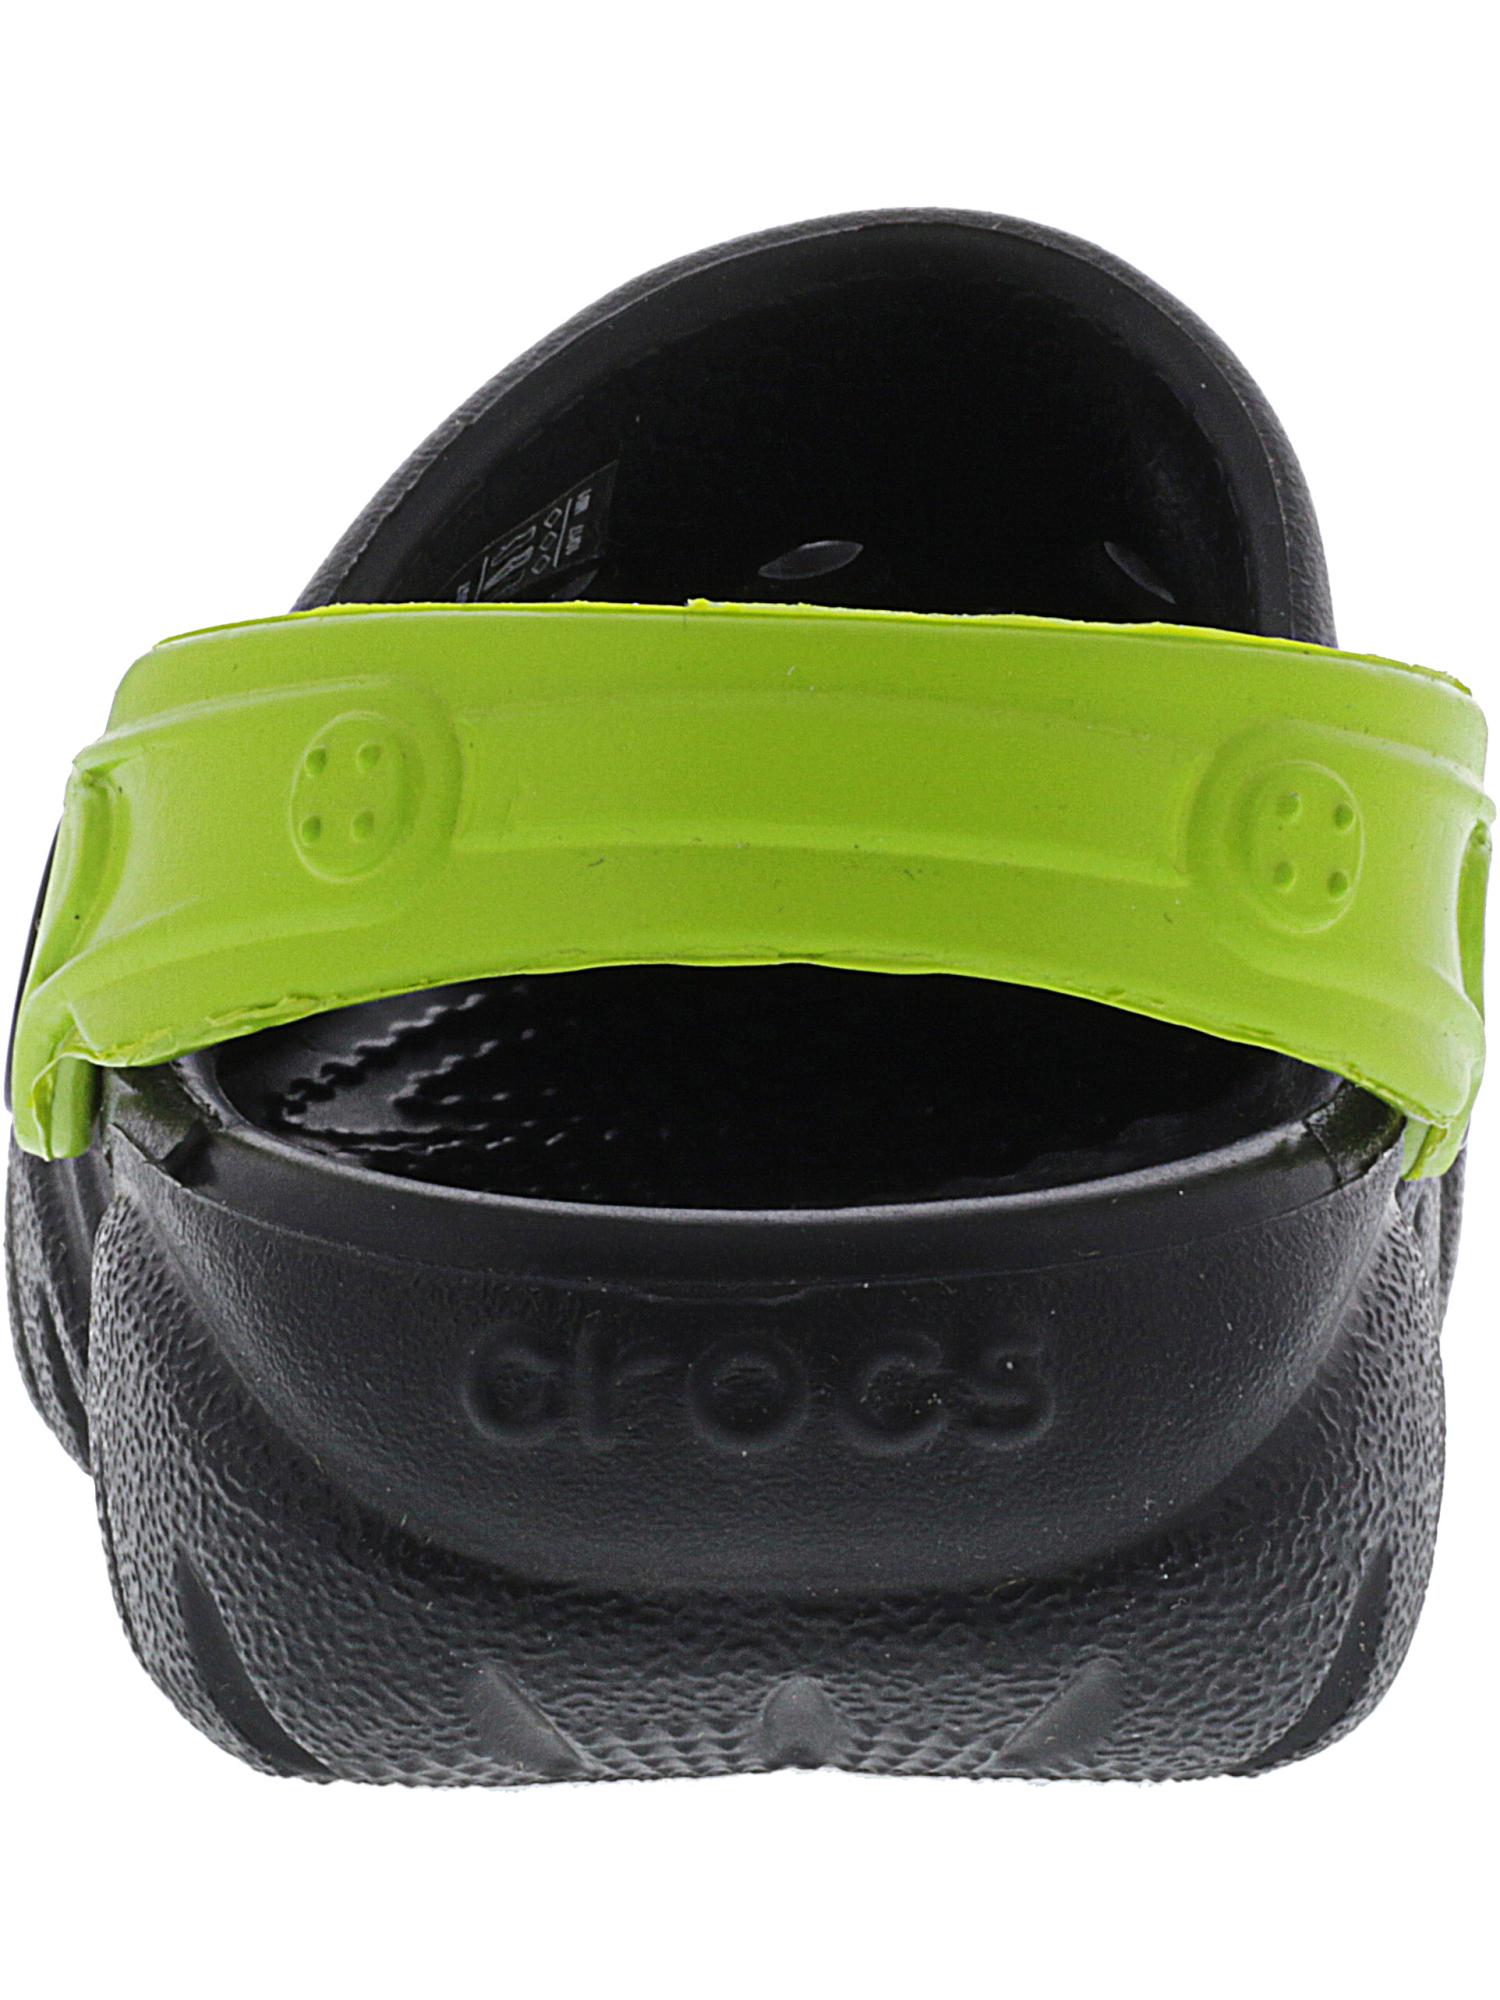 Crocs-Kids-Swiftwater-Clog-Ltd-Clogs thumbnail 6